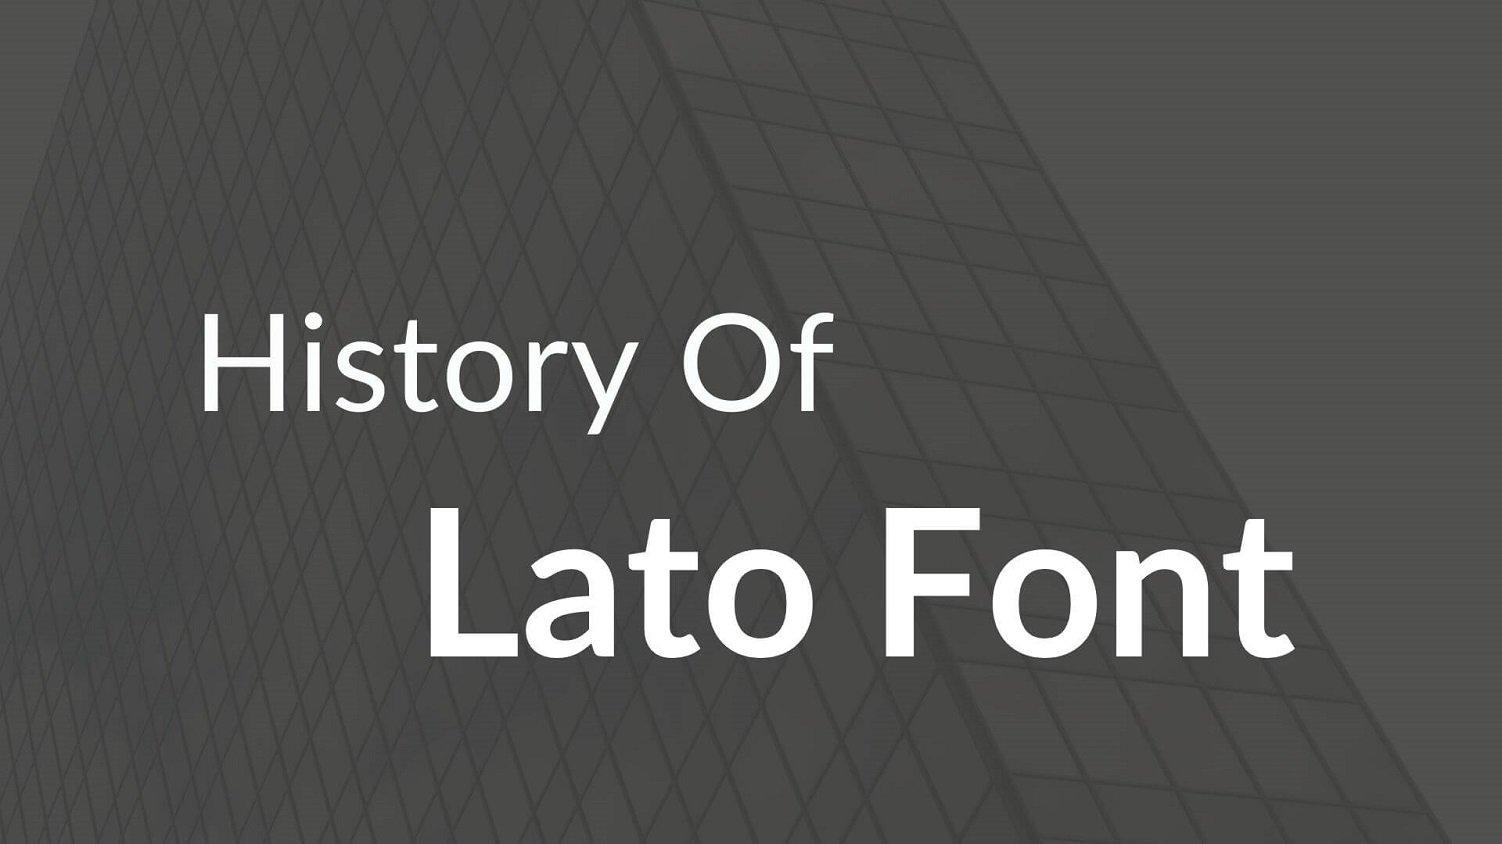 History of Lato Font